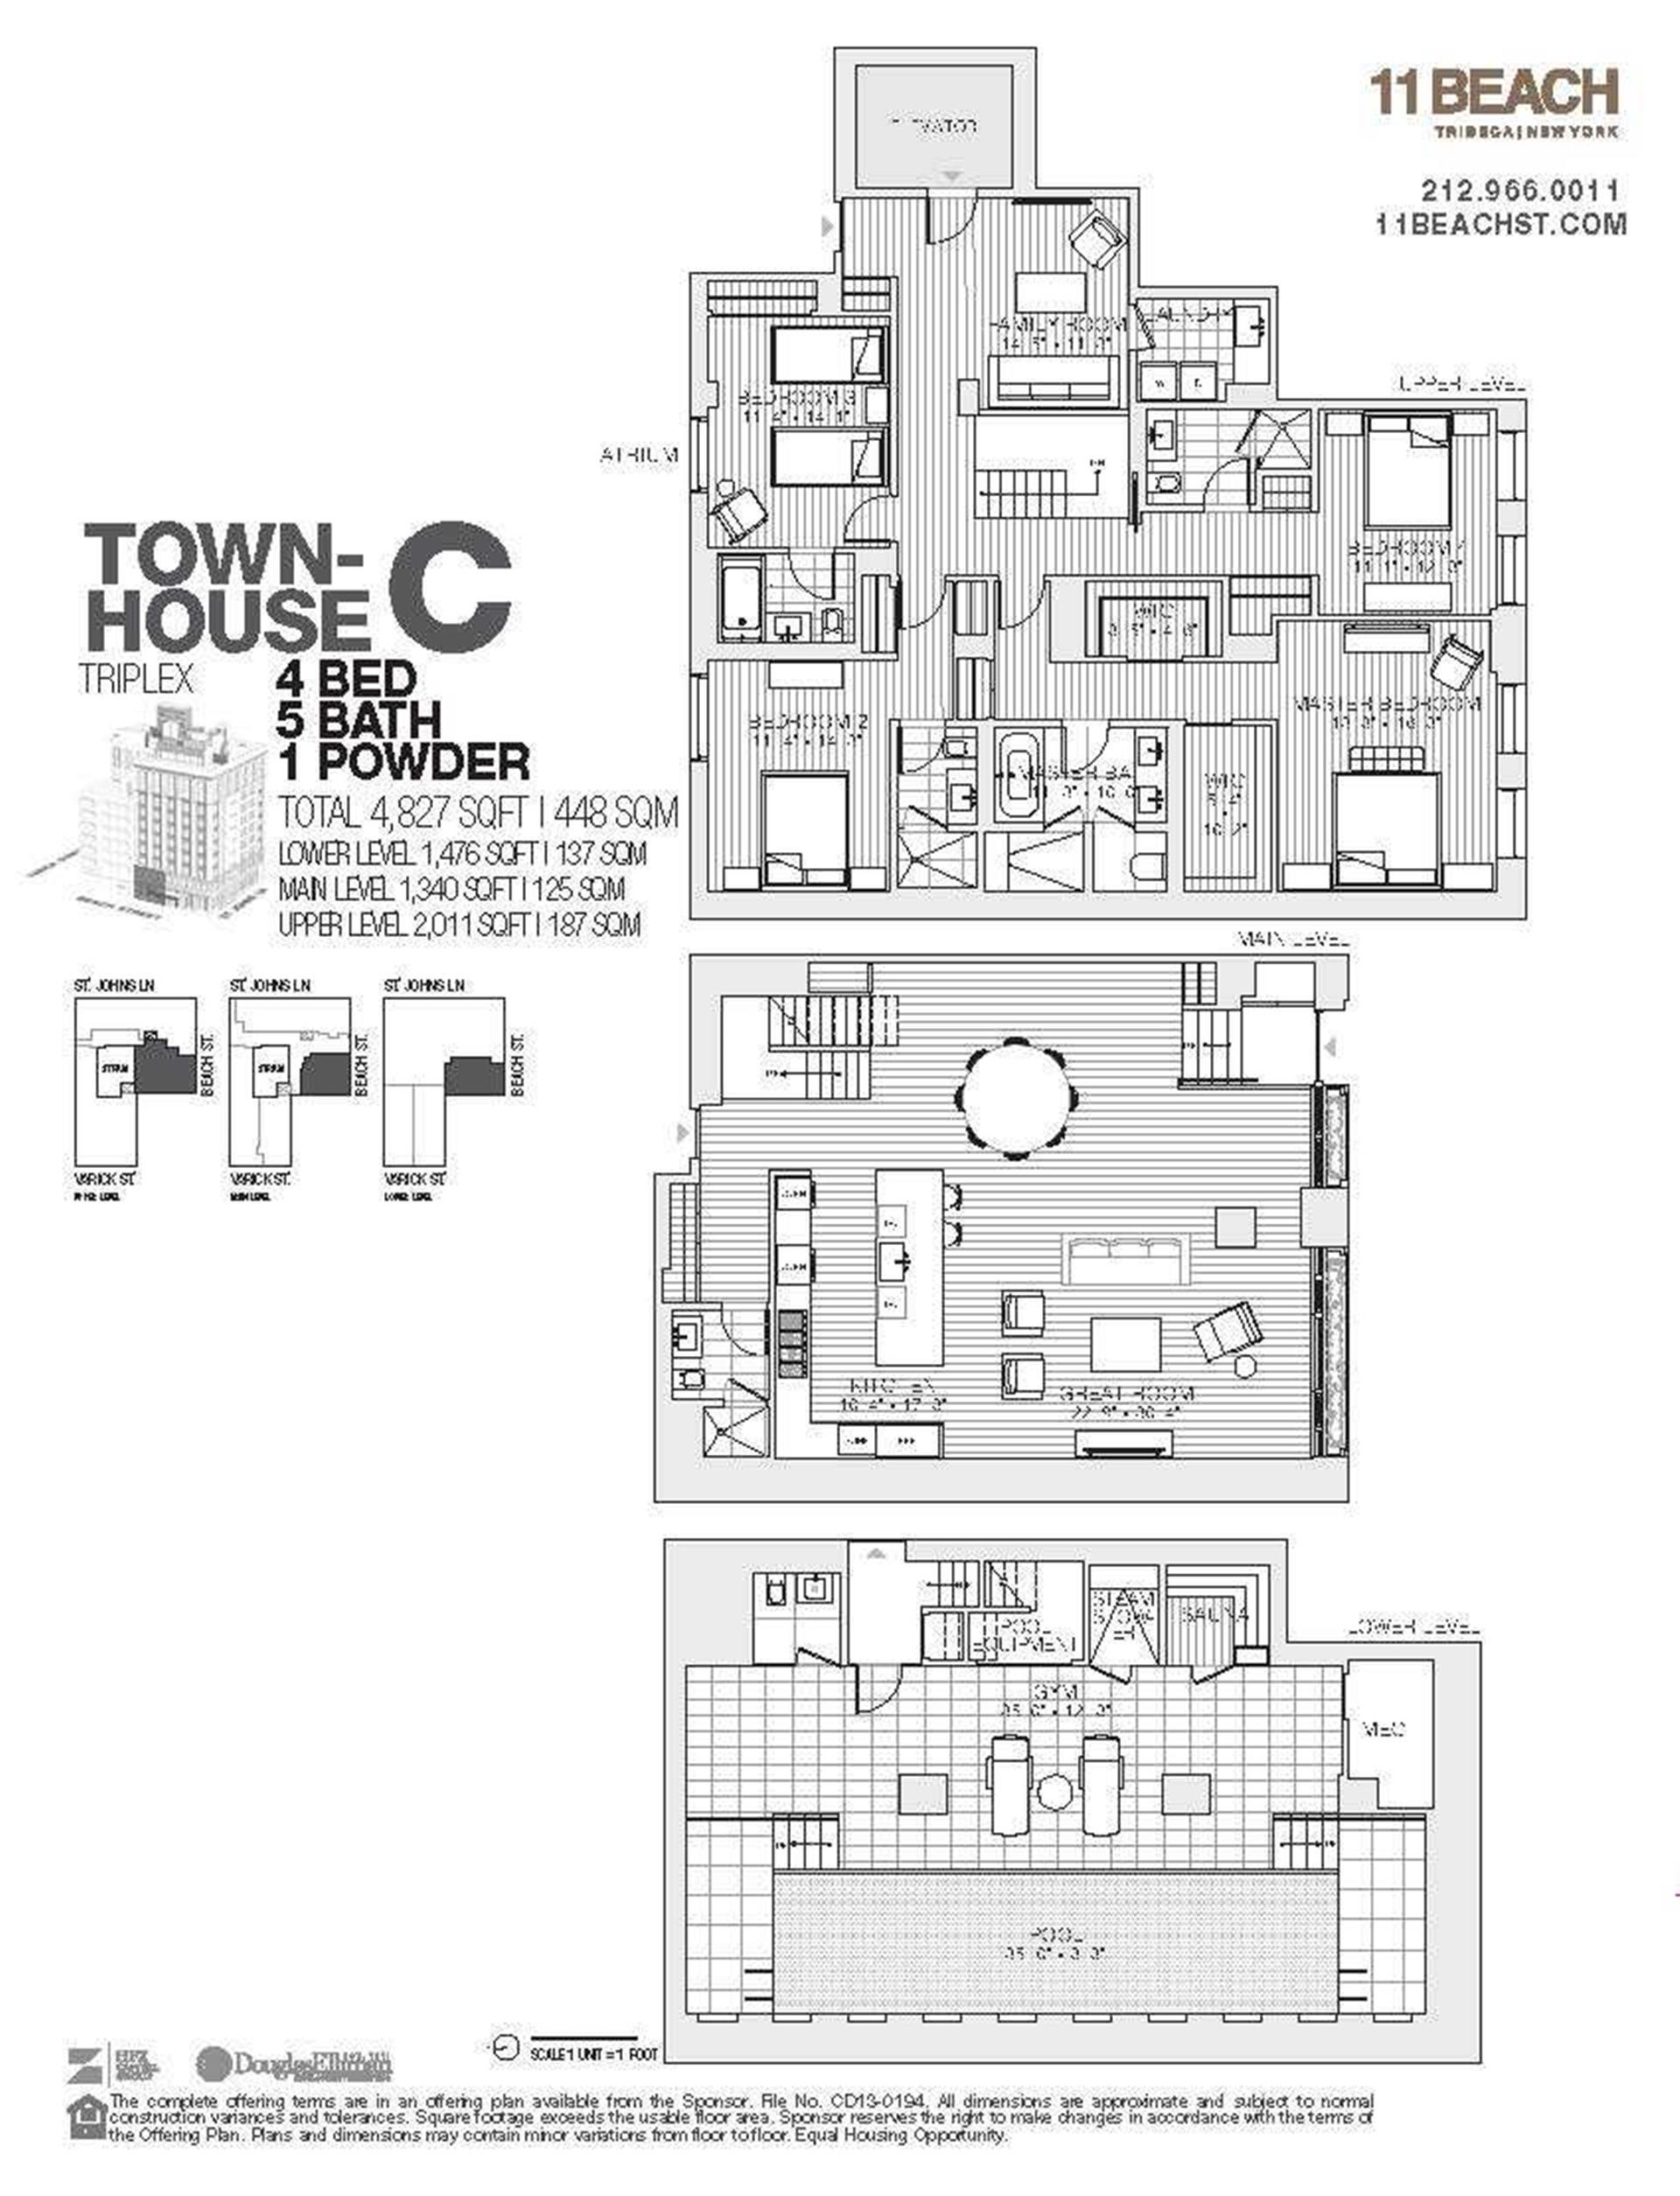 Floor plan of 11 Beach St, THSC - TriBeCa, New York